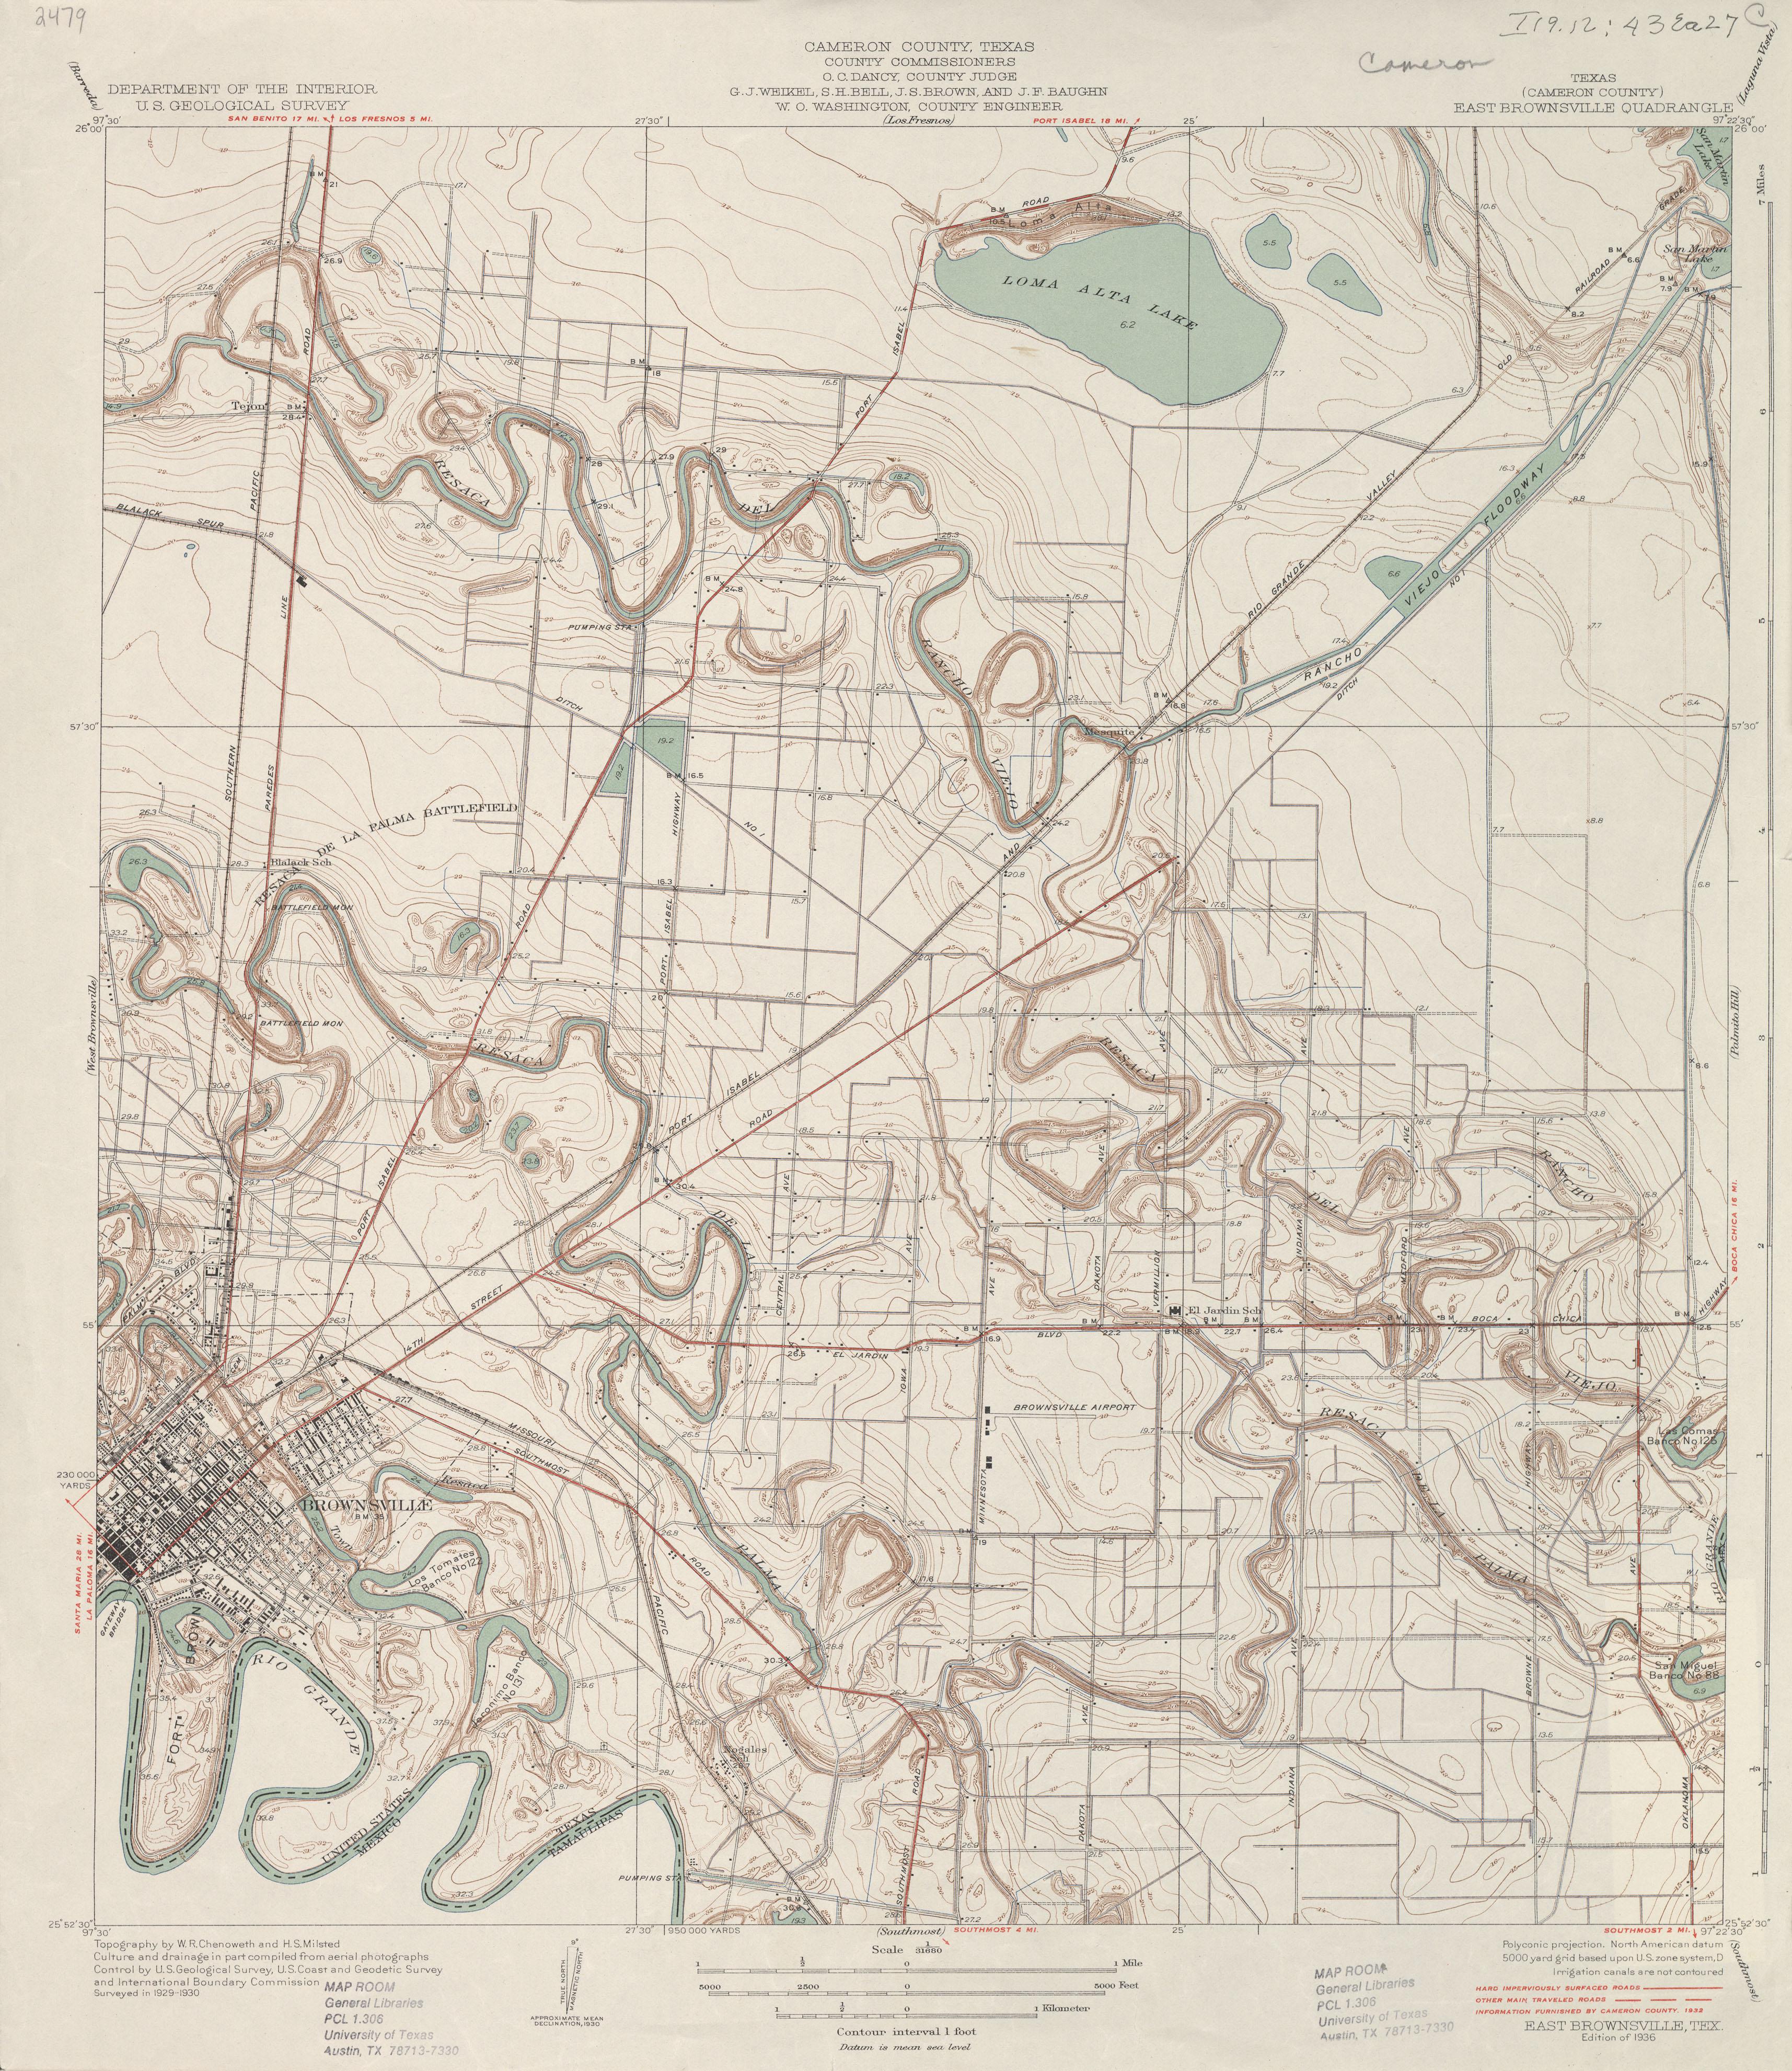 1 31 680 1930 survey 1932 overprint 3 3 mb